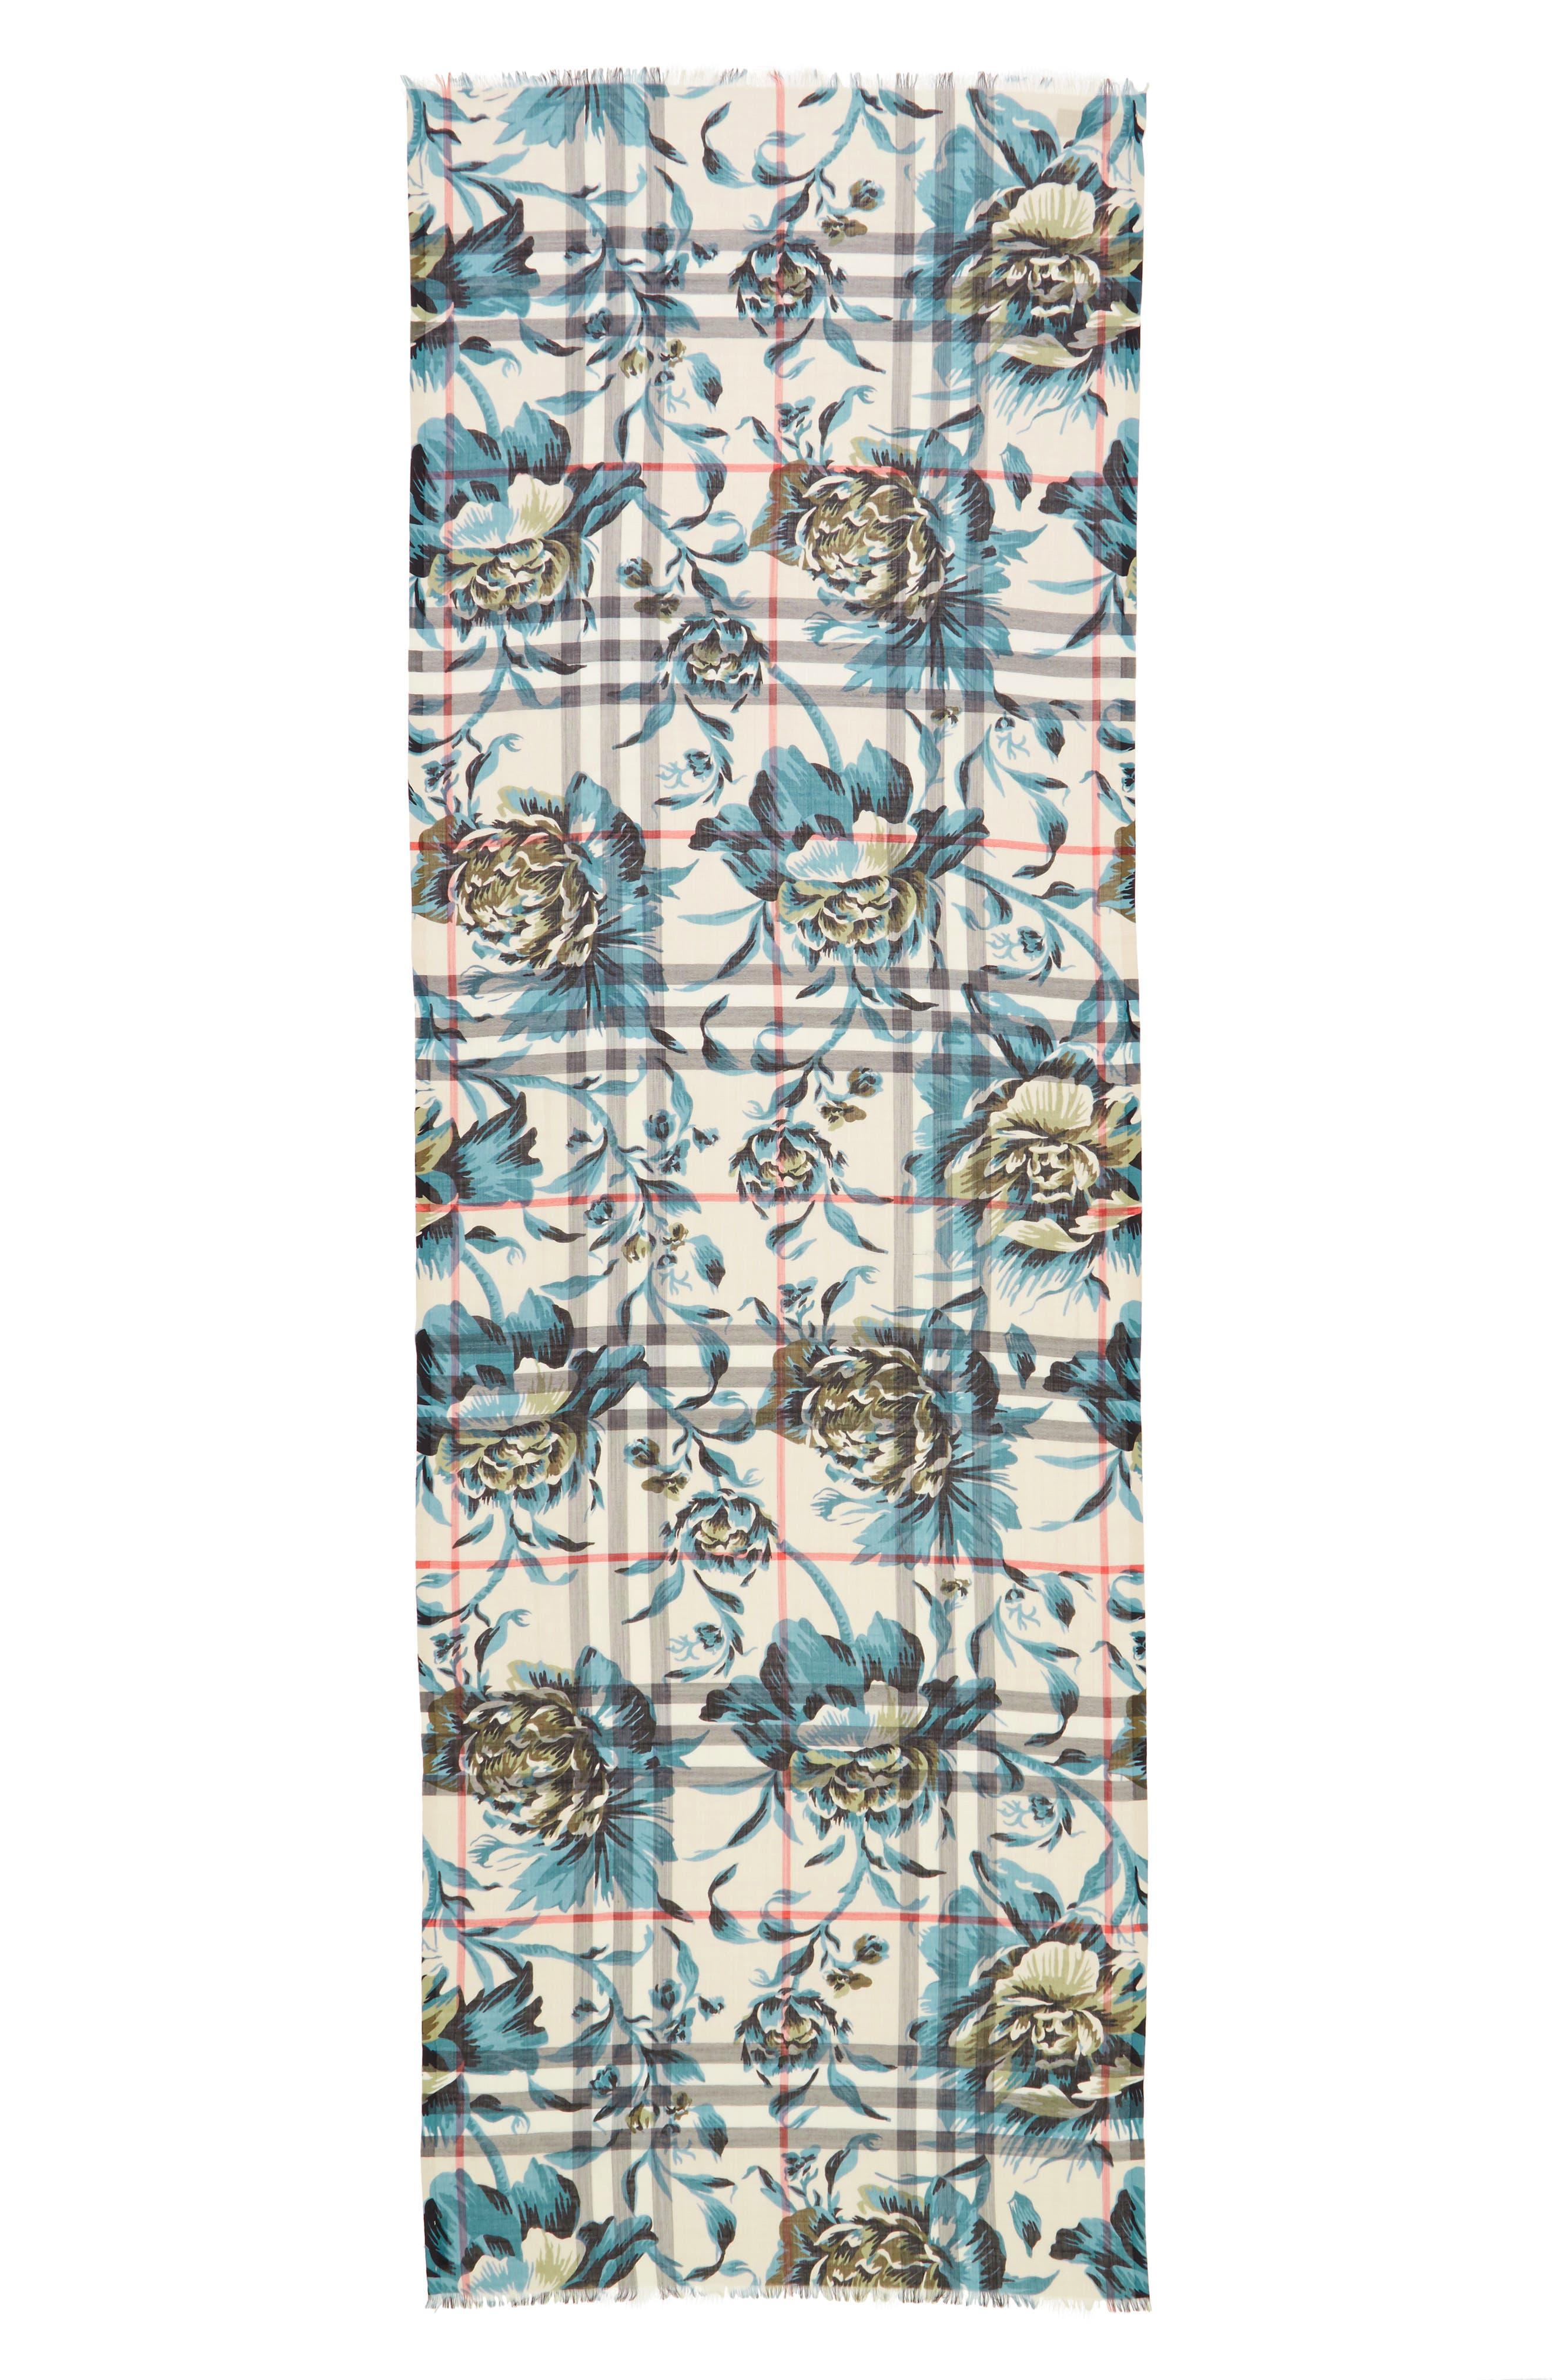 Alternate Image 1 Selected - Burberry Floral Print Wool & Silk Scarf